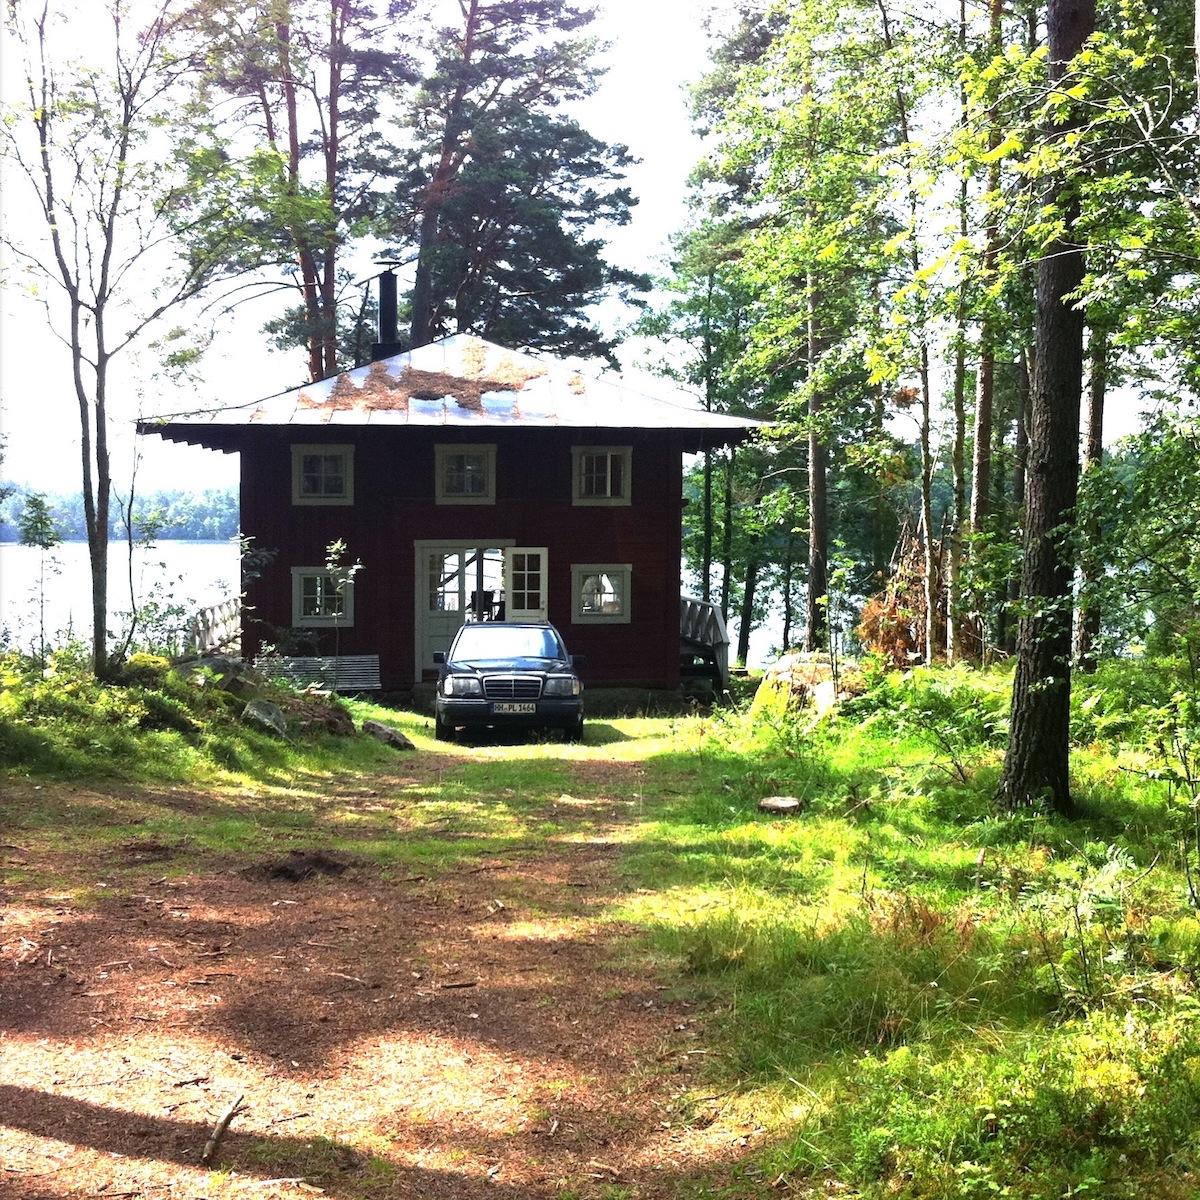 Sommarstuga - Ferienhäuser, Lelleborg Norrby